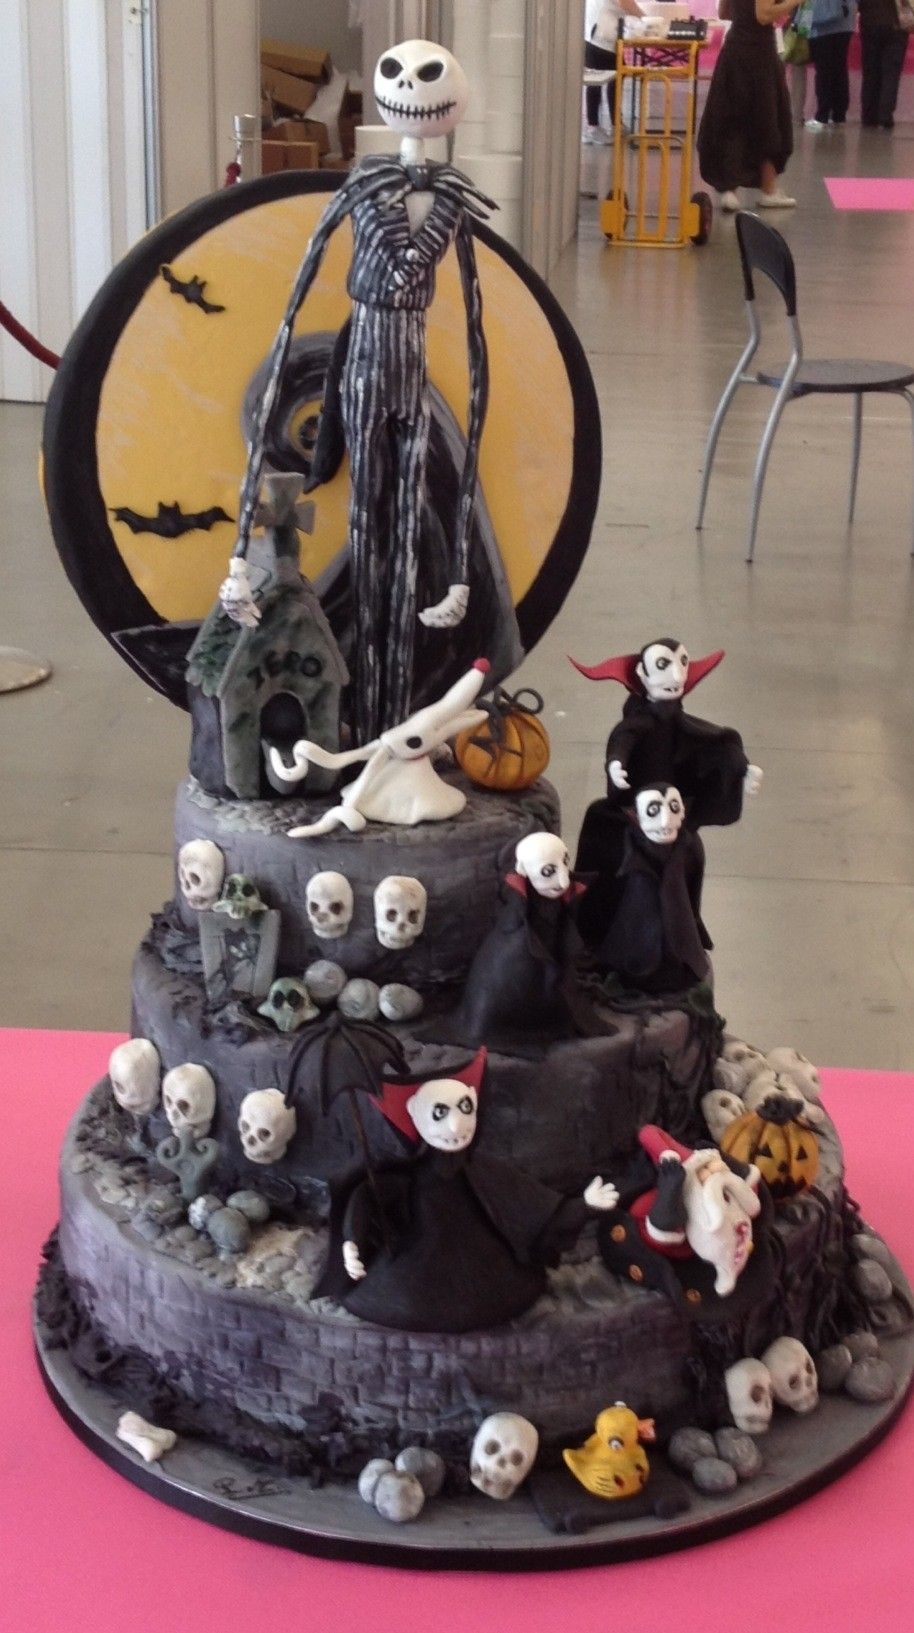 Halloween Nightmare Before Christmas Cake 2014 Birthday Design ...